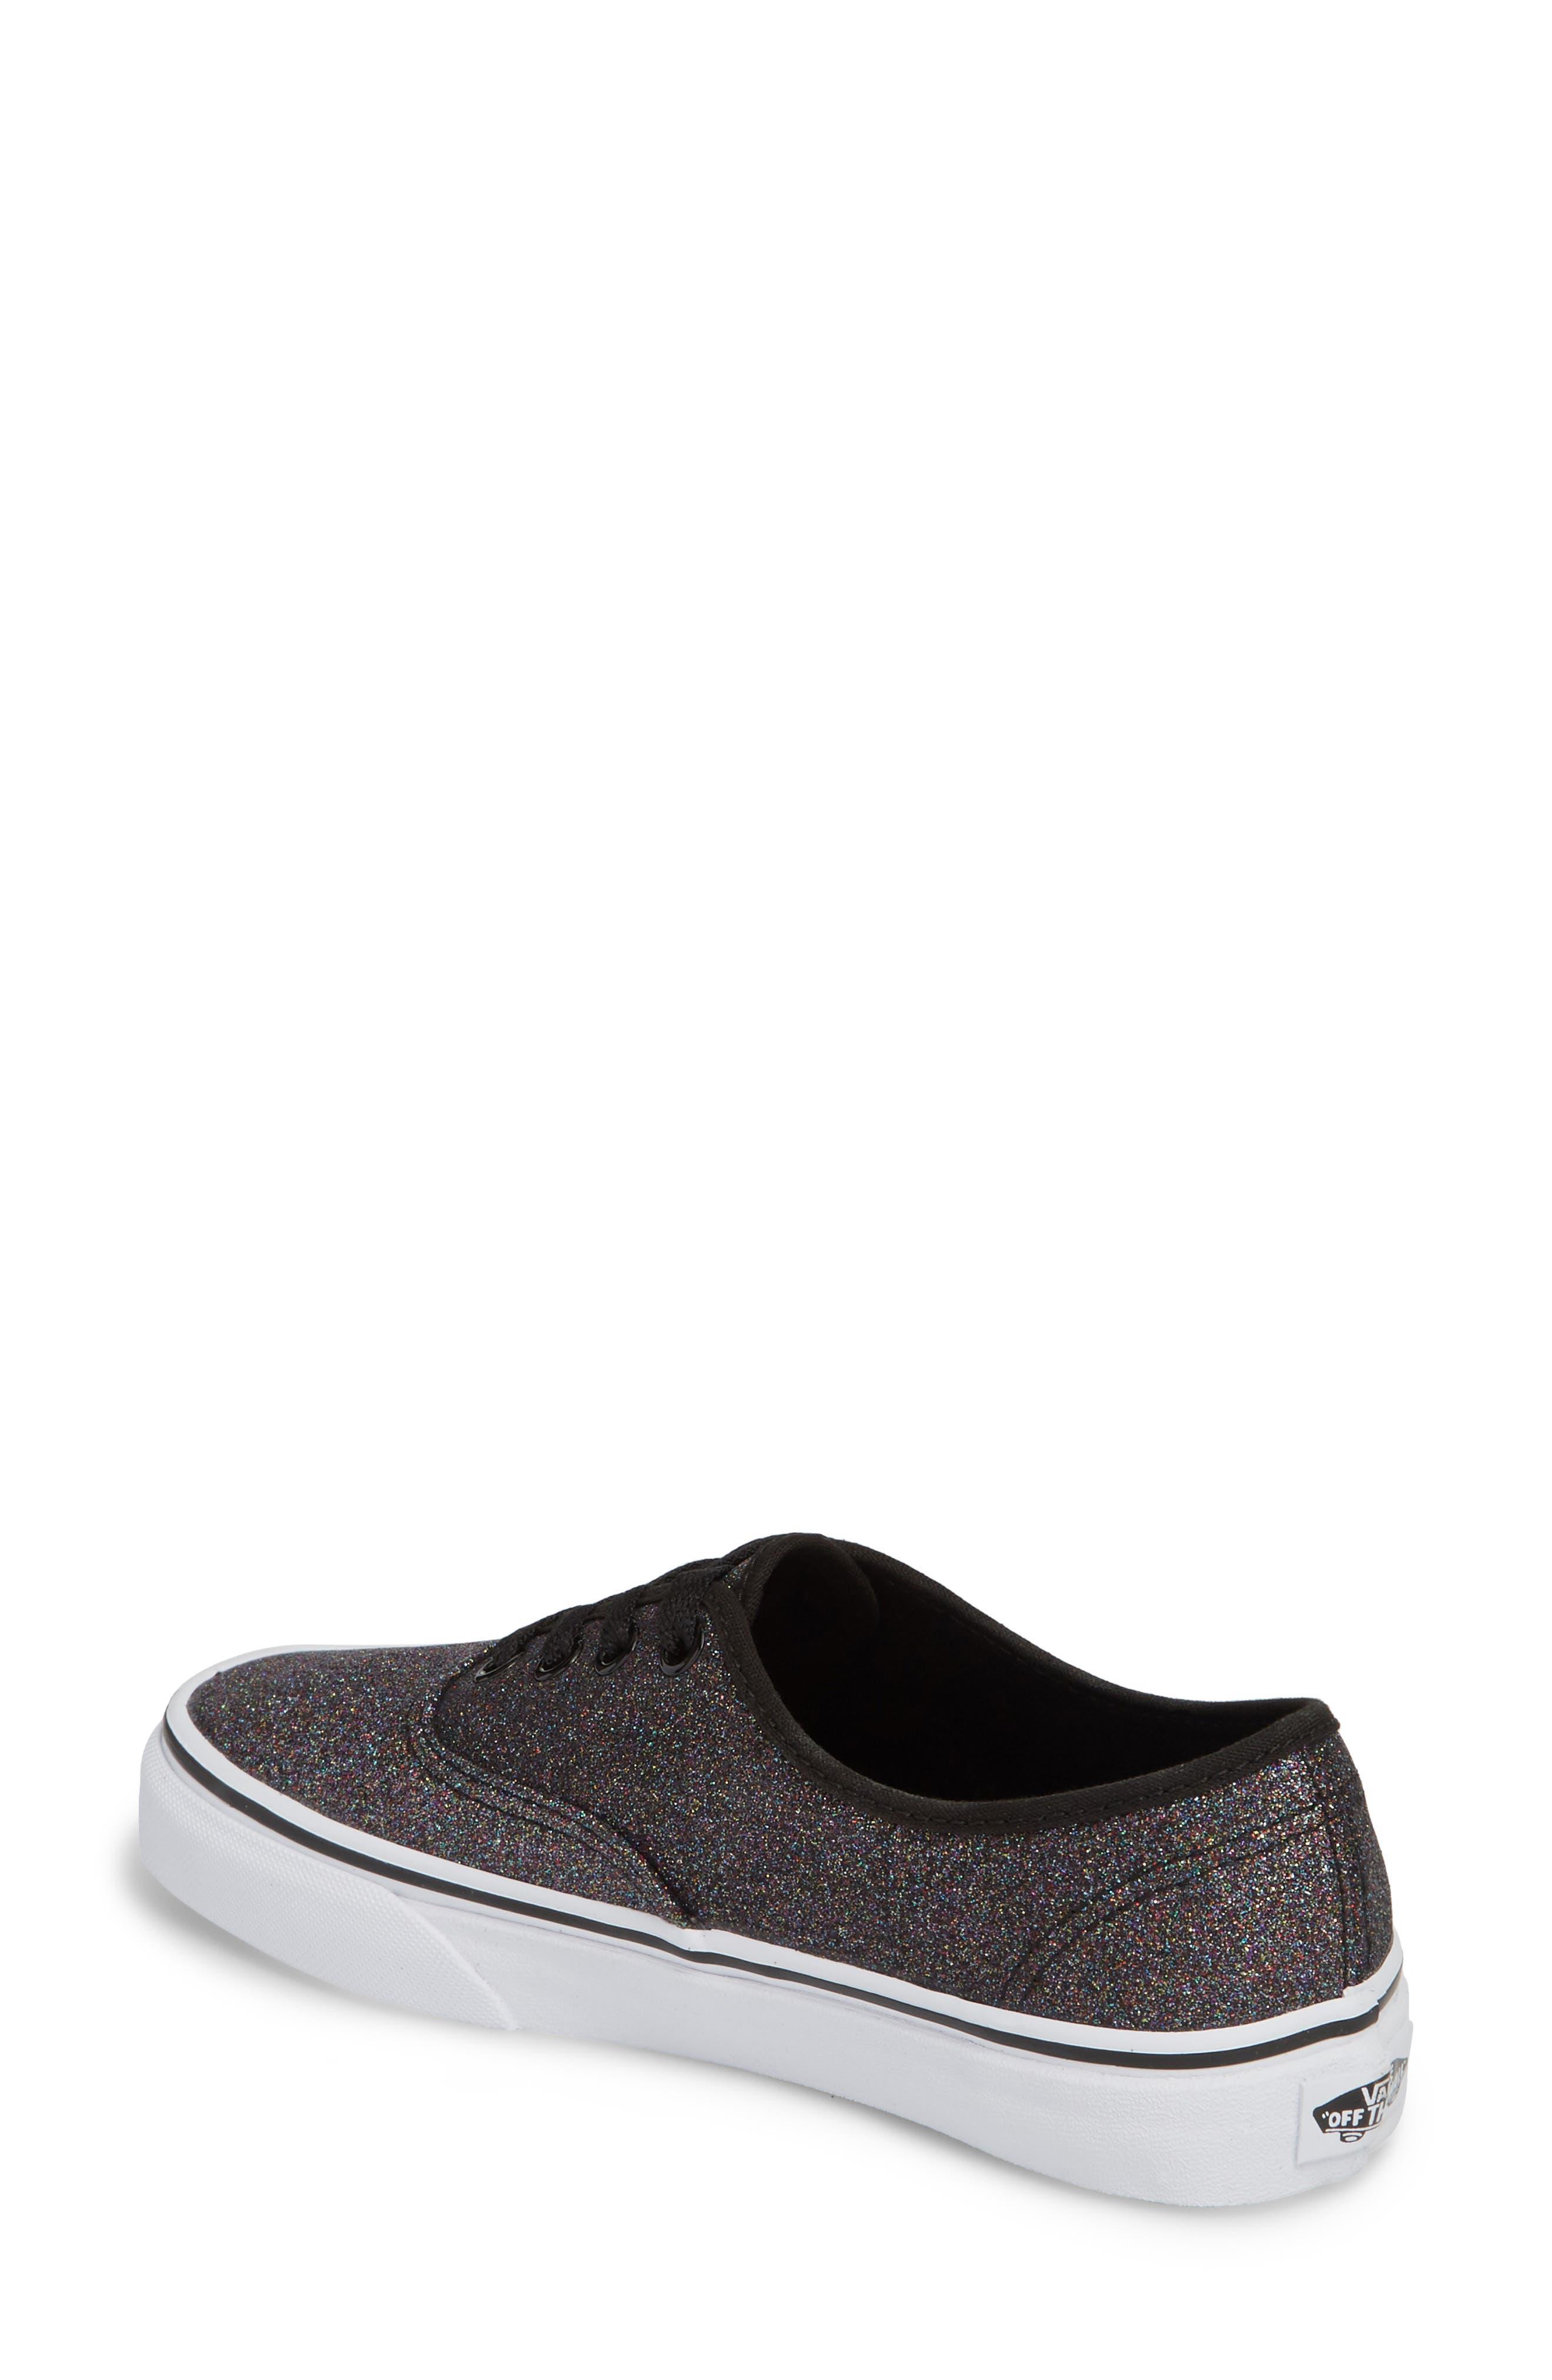 ,                             'Authentic' Sneaker,                             Alternate thumbnail 58, color,                             004